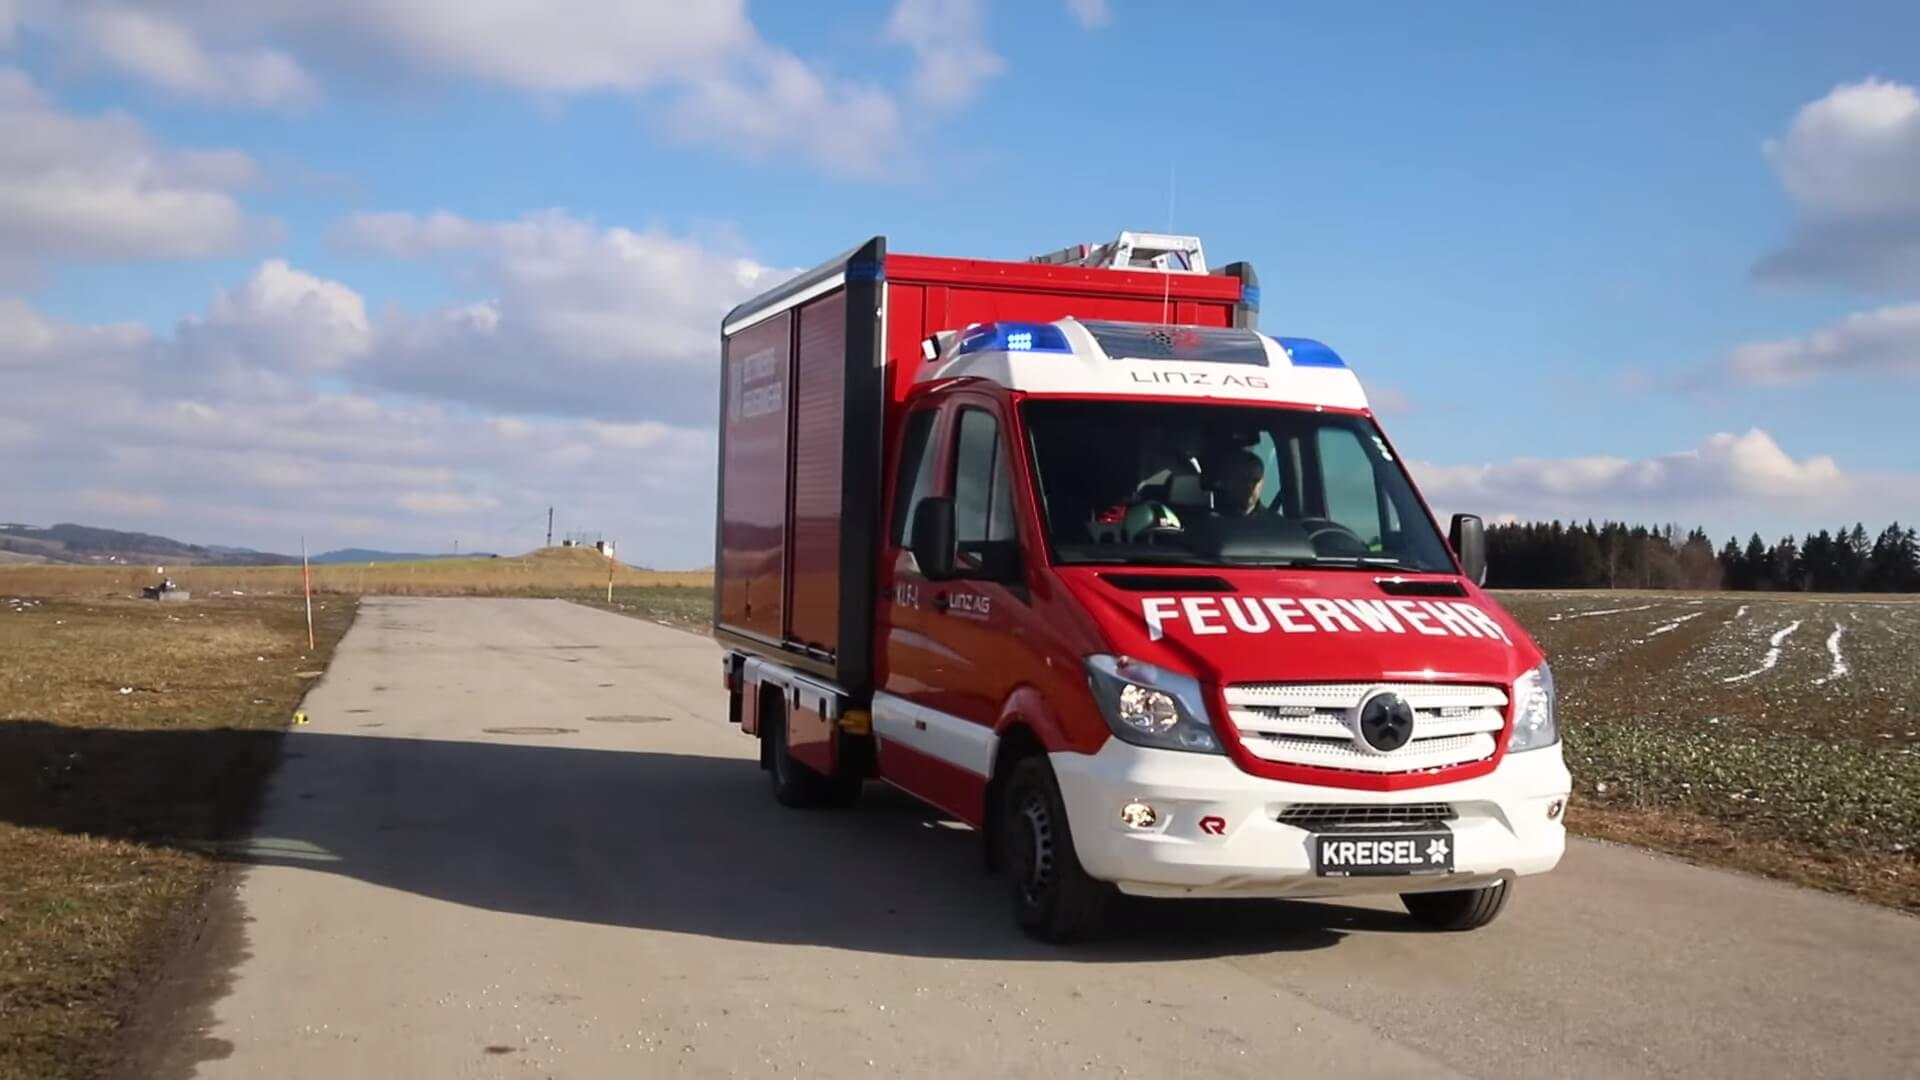 Первый пожарный электромобиль от Kreisel Electric на базе Mercedes Sprinter